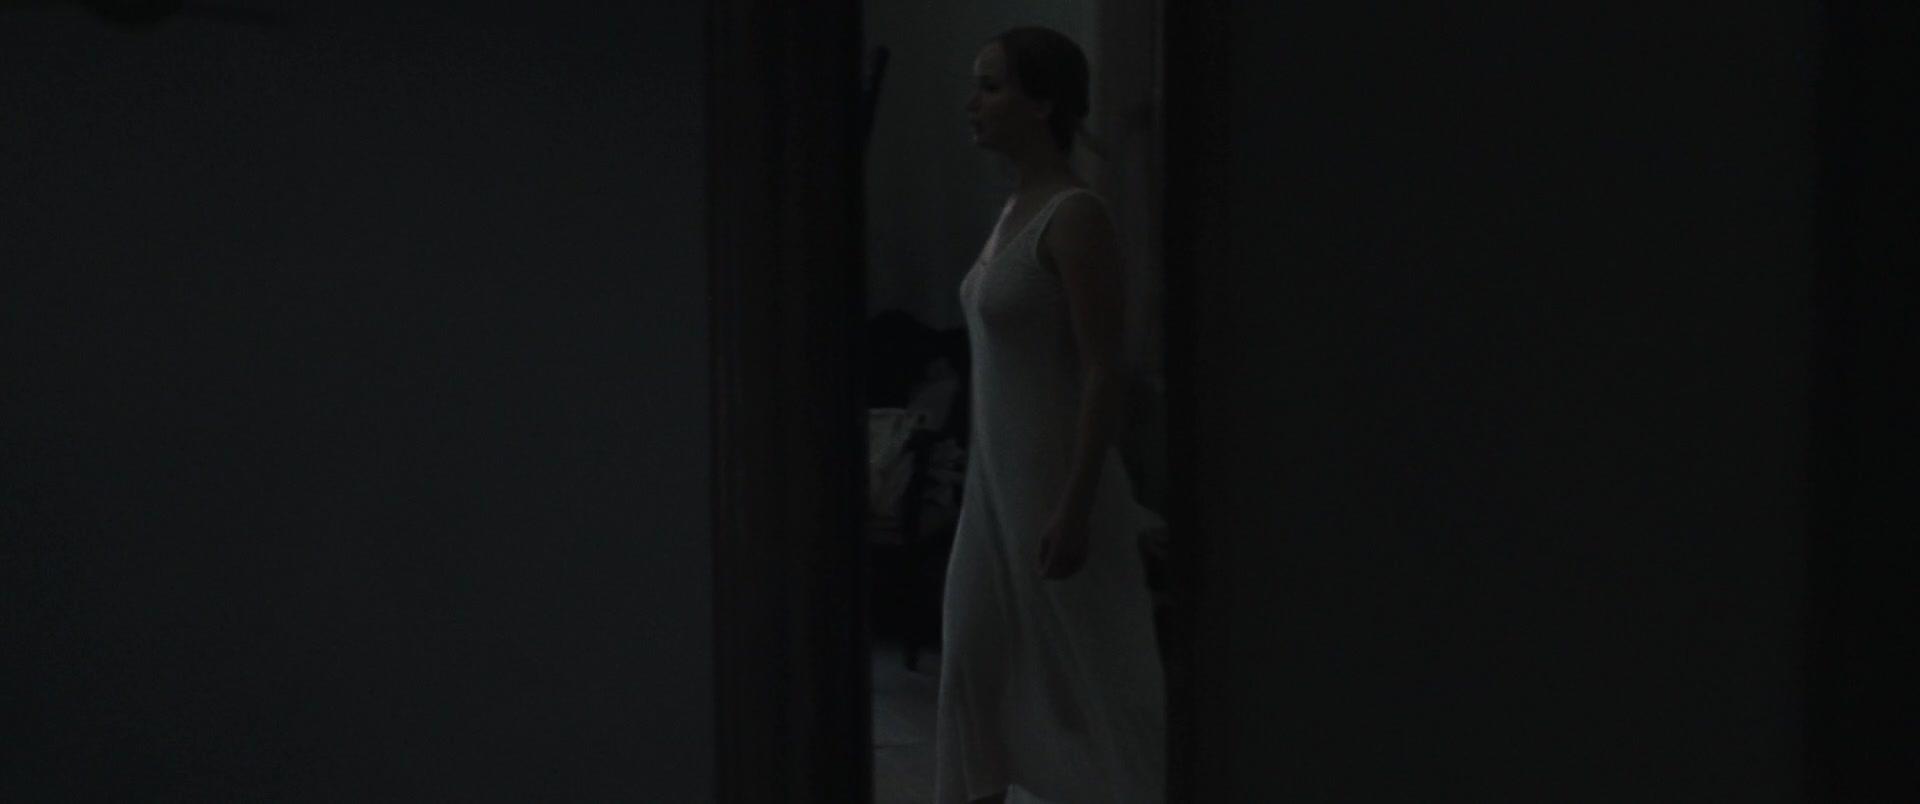 Jennifer-Lawrence-Michelle-Pfeiffer-Mother-8-thefappeningblog.com_.jpg